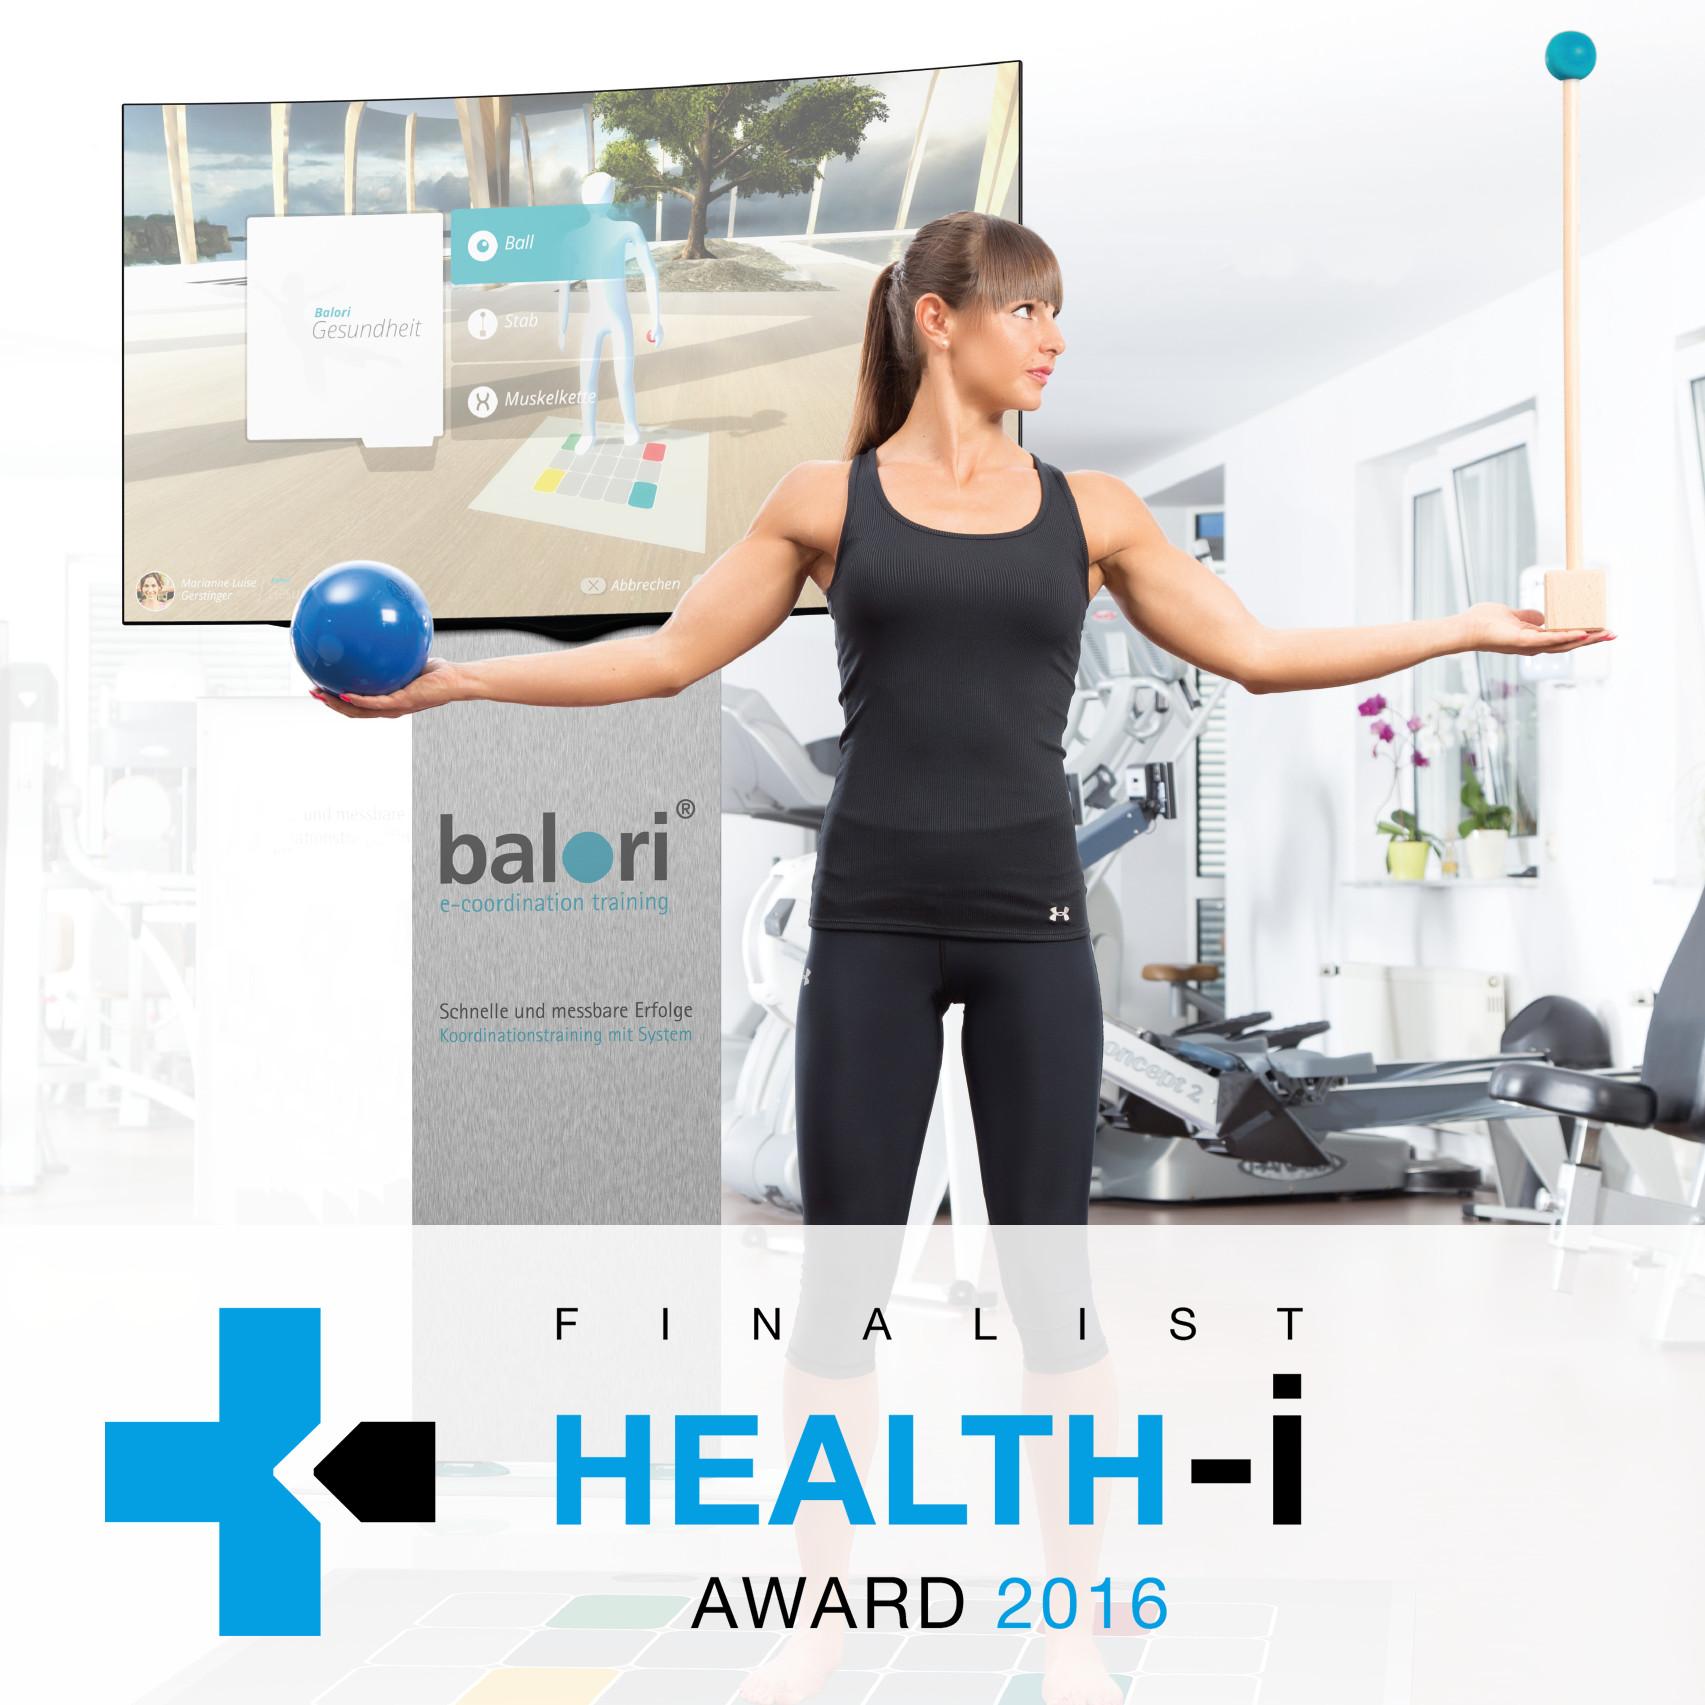 balori_e-coordination-medica-2016